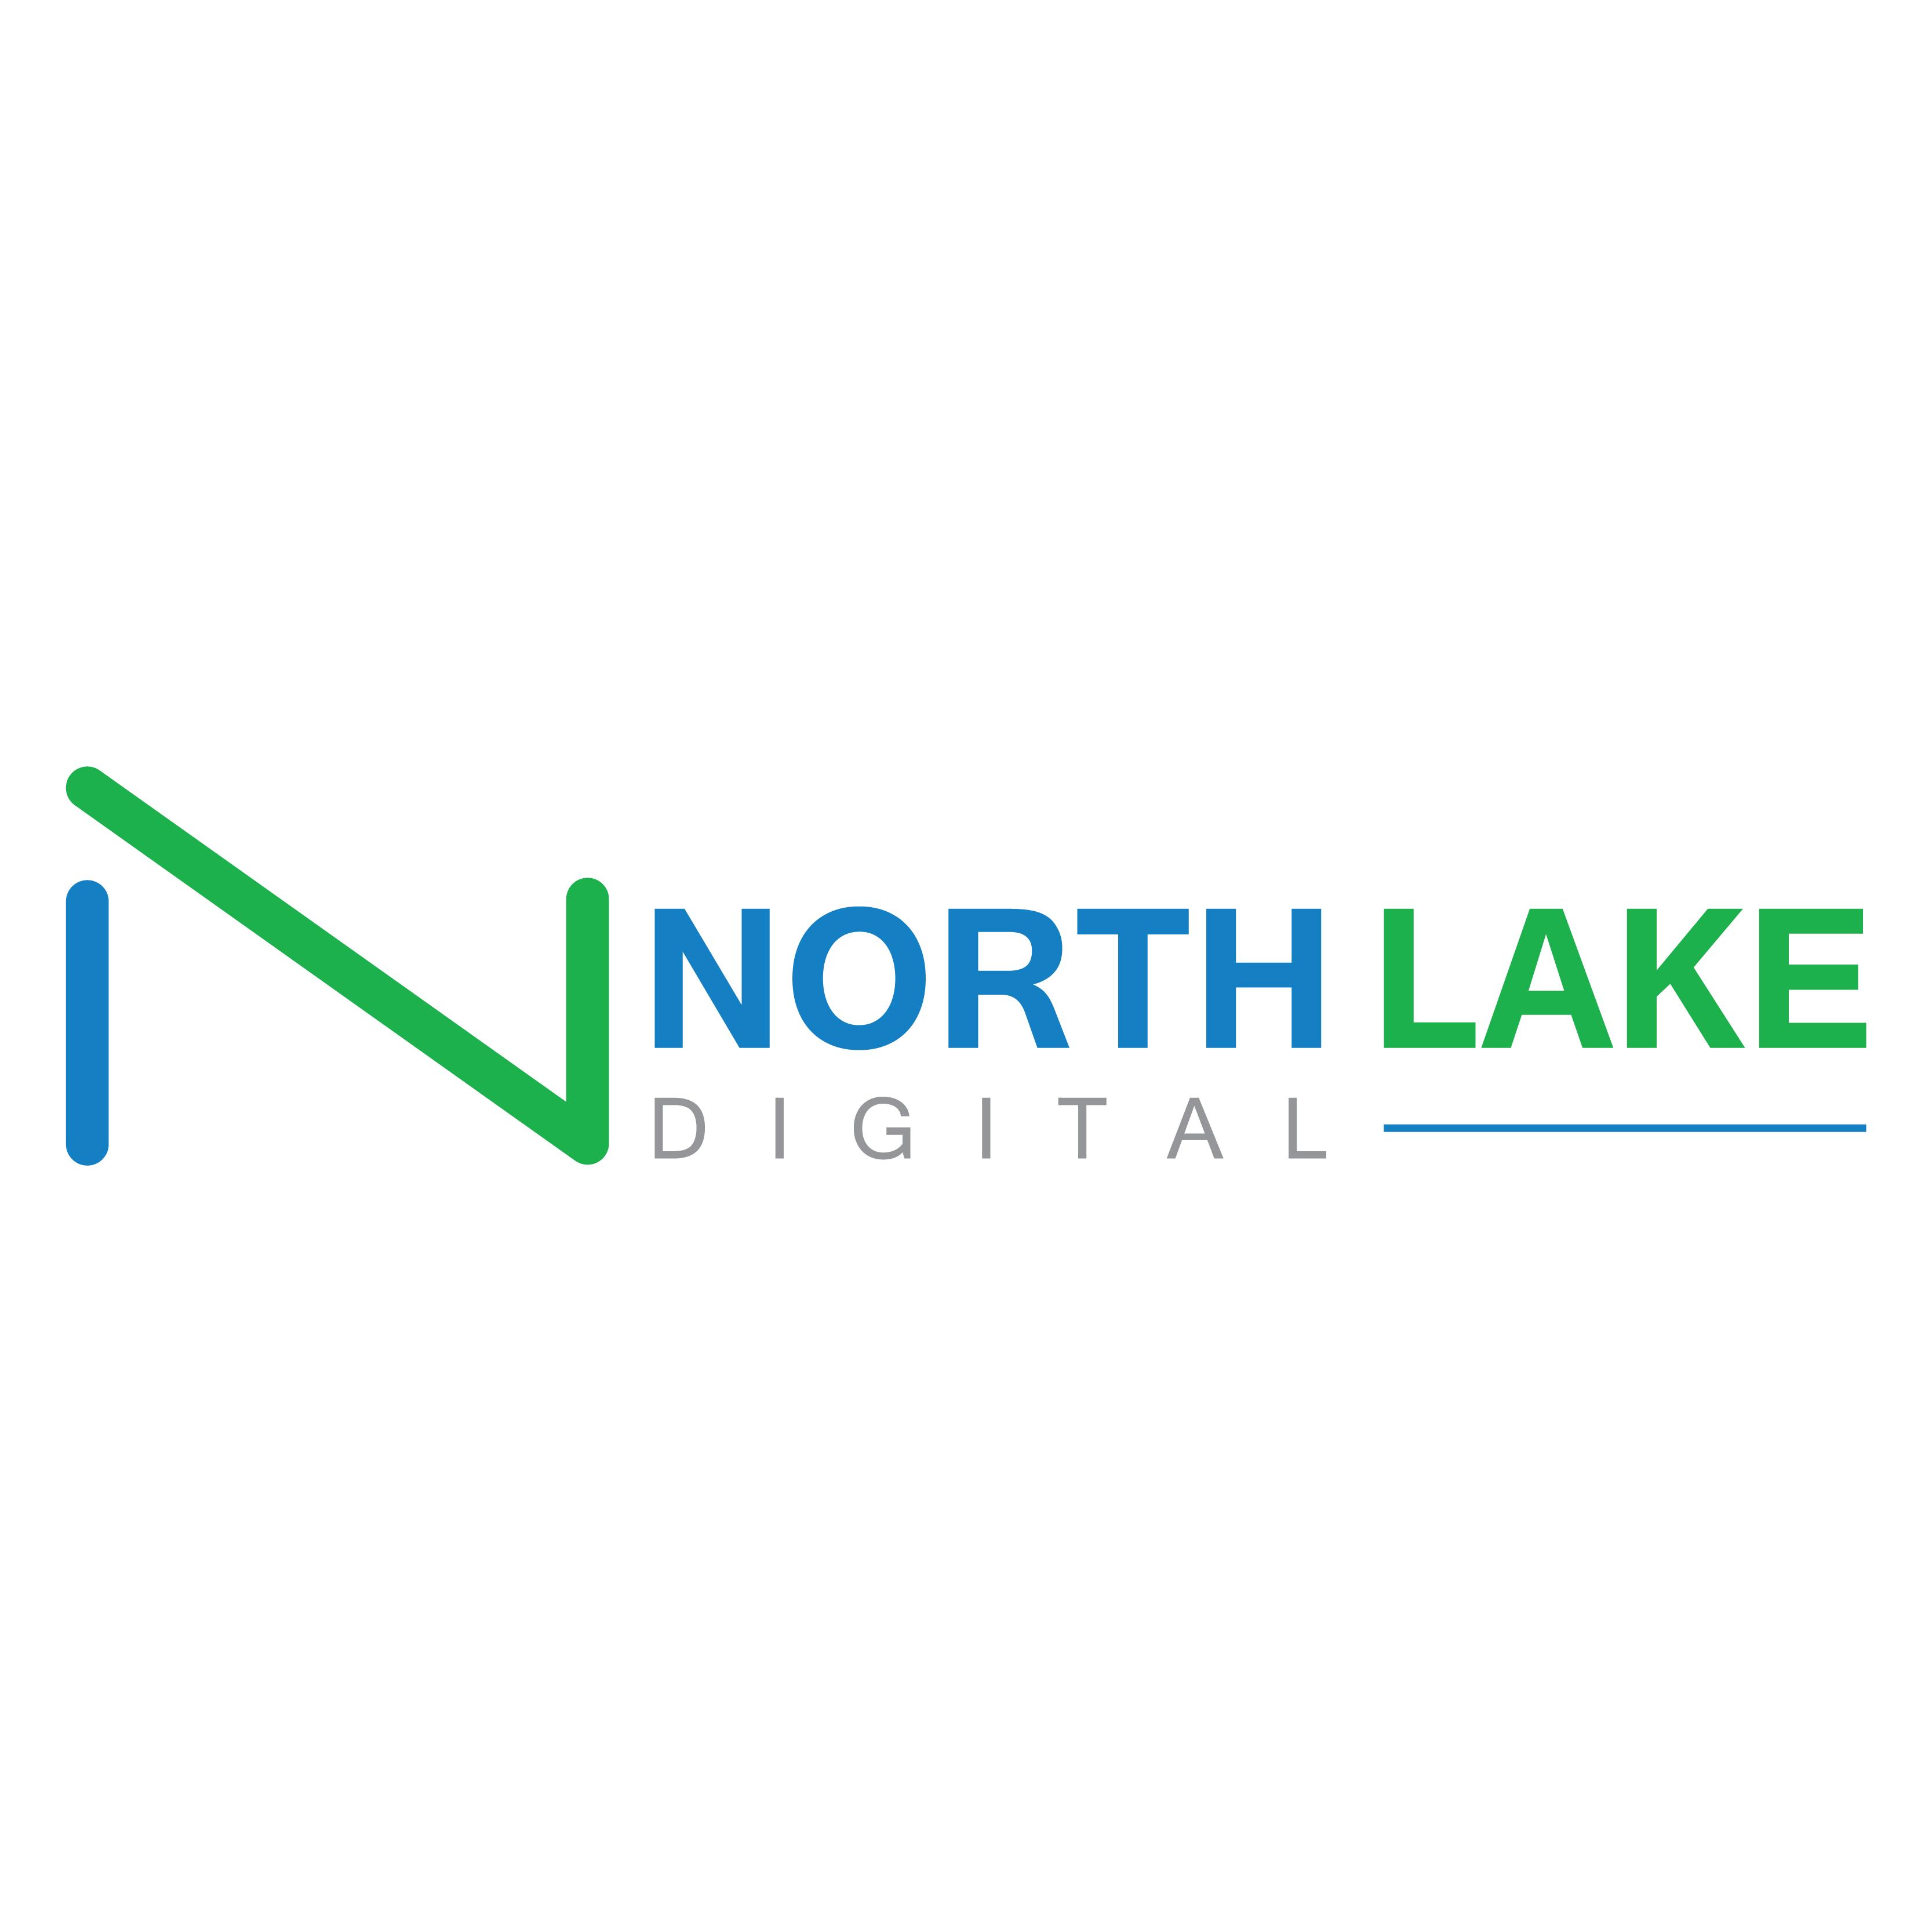 NorthLake Digital, LLC